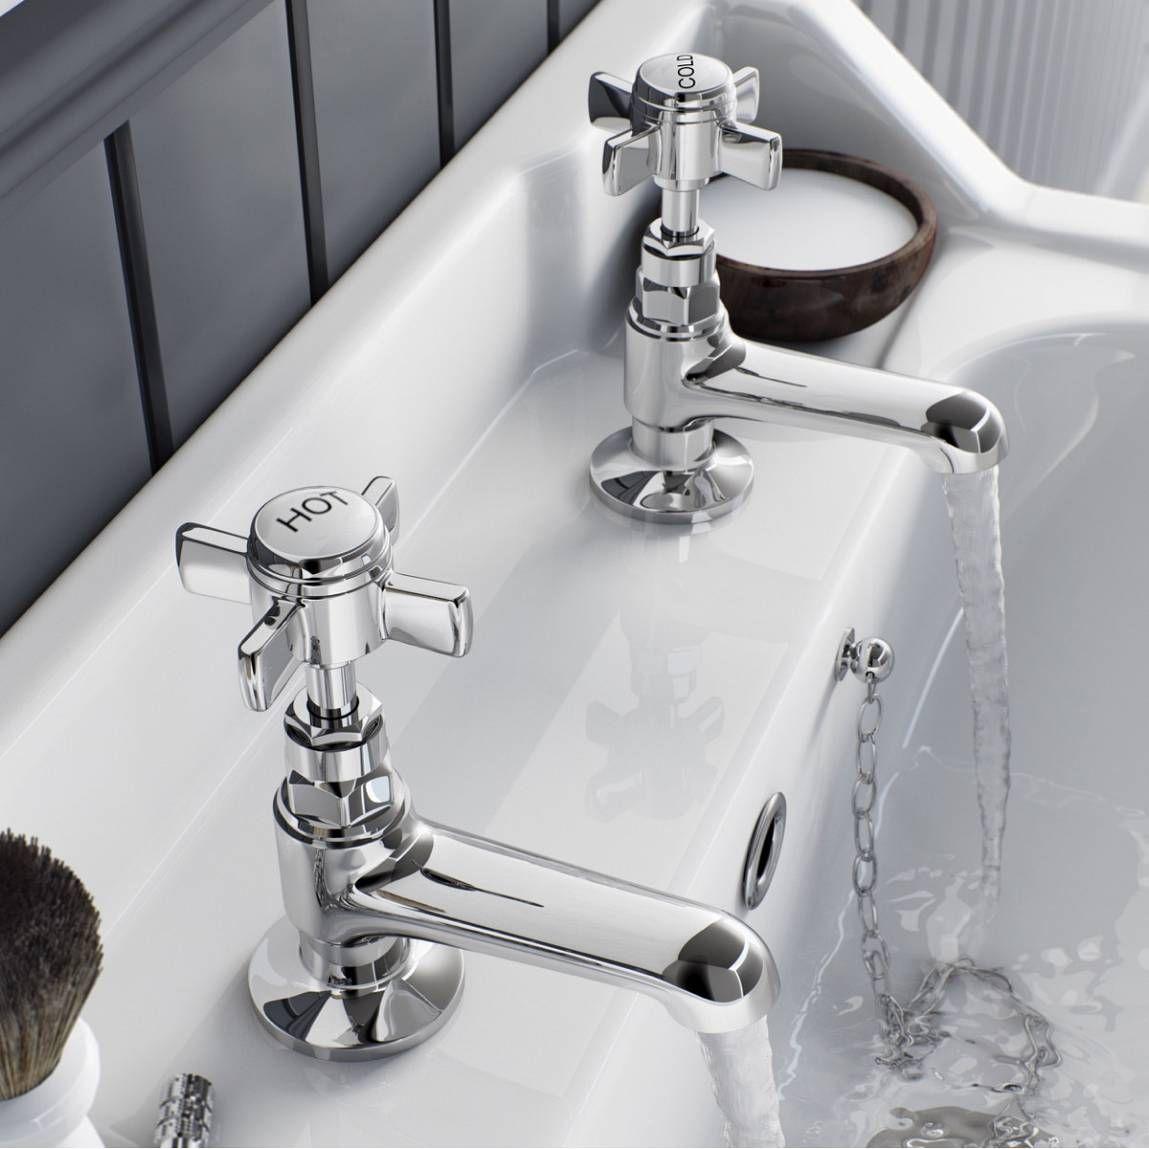 Hampshire Basin Taps Victoria Plumb Chrome Taps Basin Taps Bathroom Basin Taps